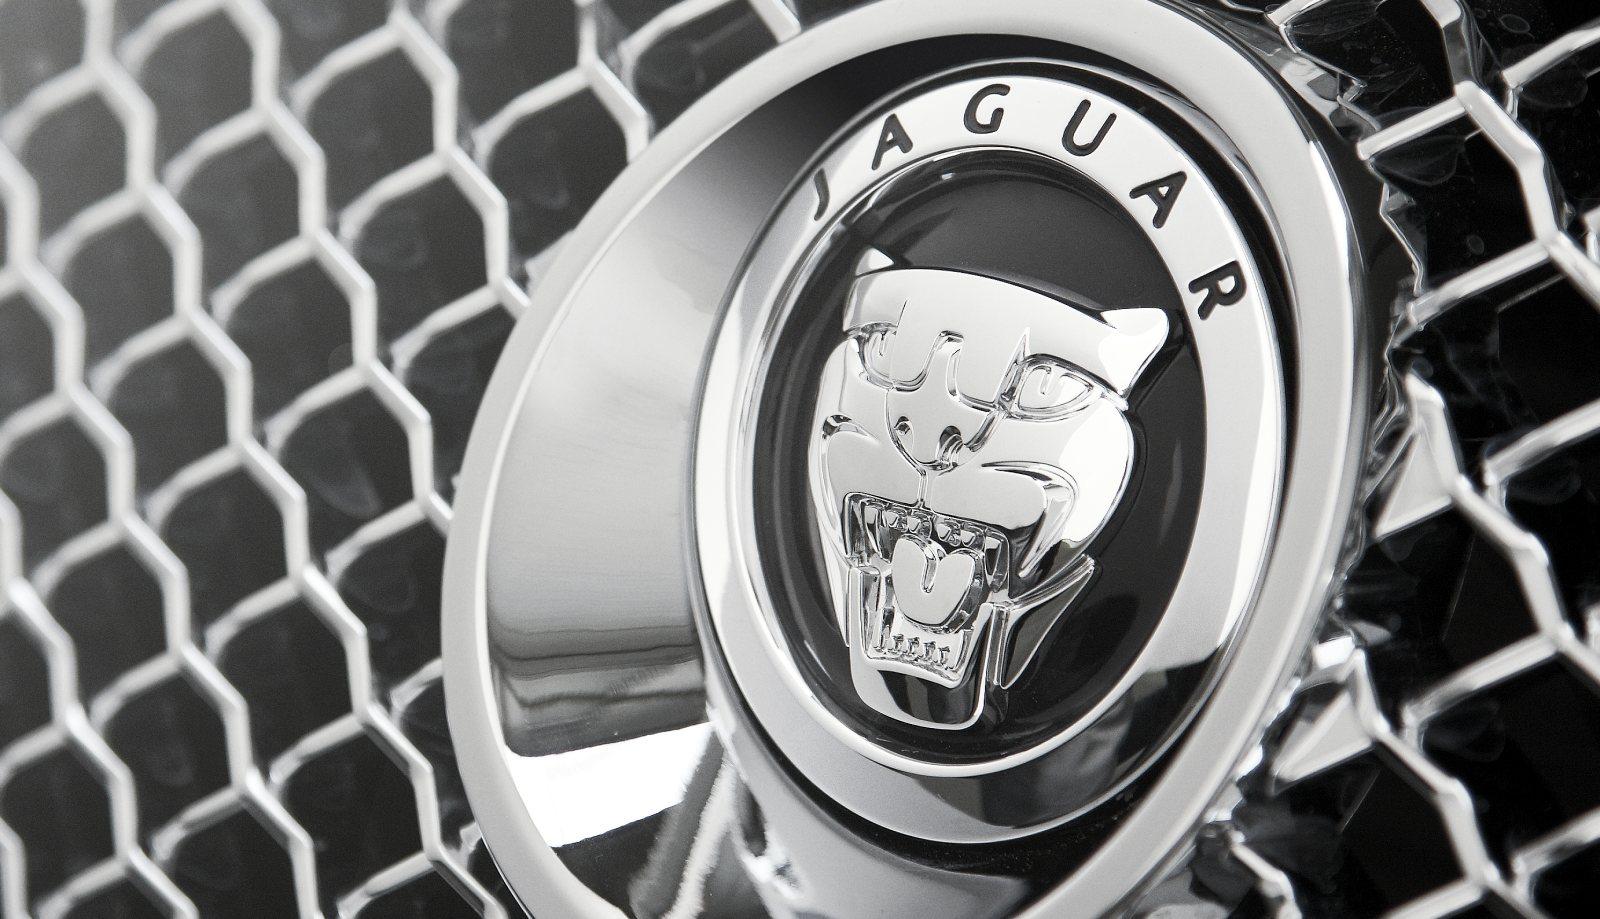 Fwd Jaguar Compact Still Under Consideration